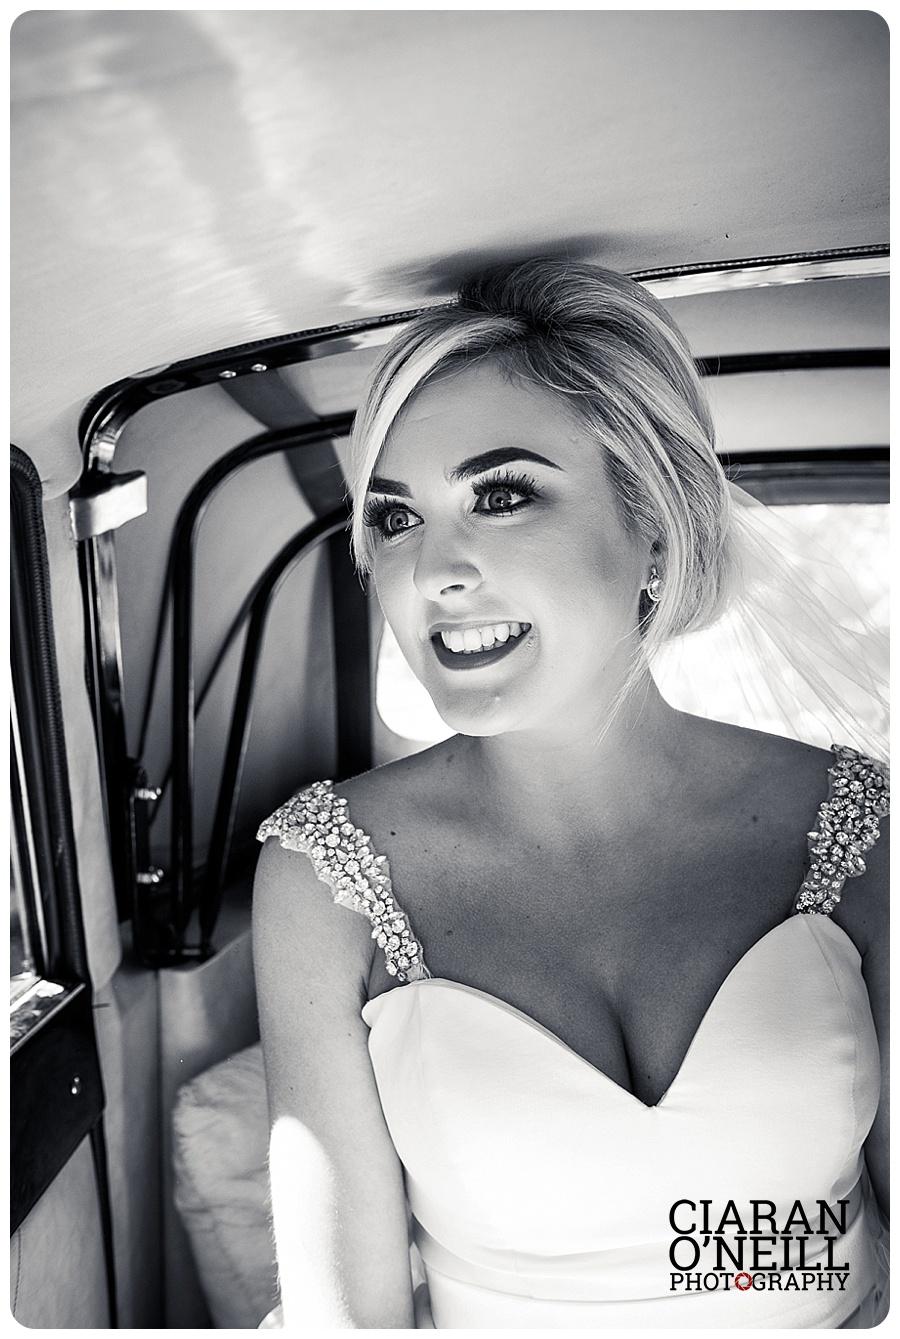 Bernadette & Niall's wedding at the Four Season Carlingford Hotel by Ciaran O'Neill Photography